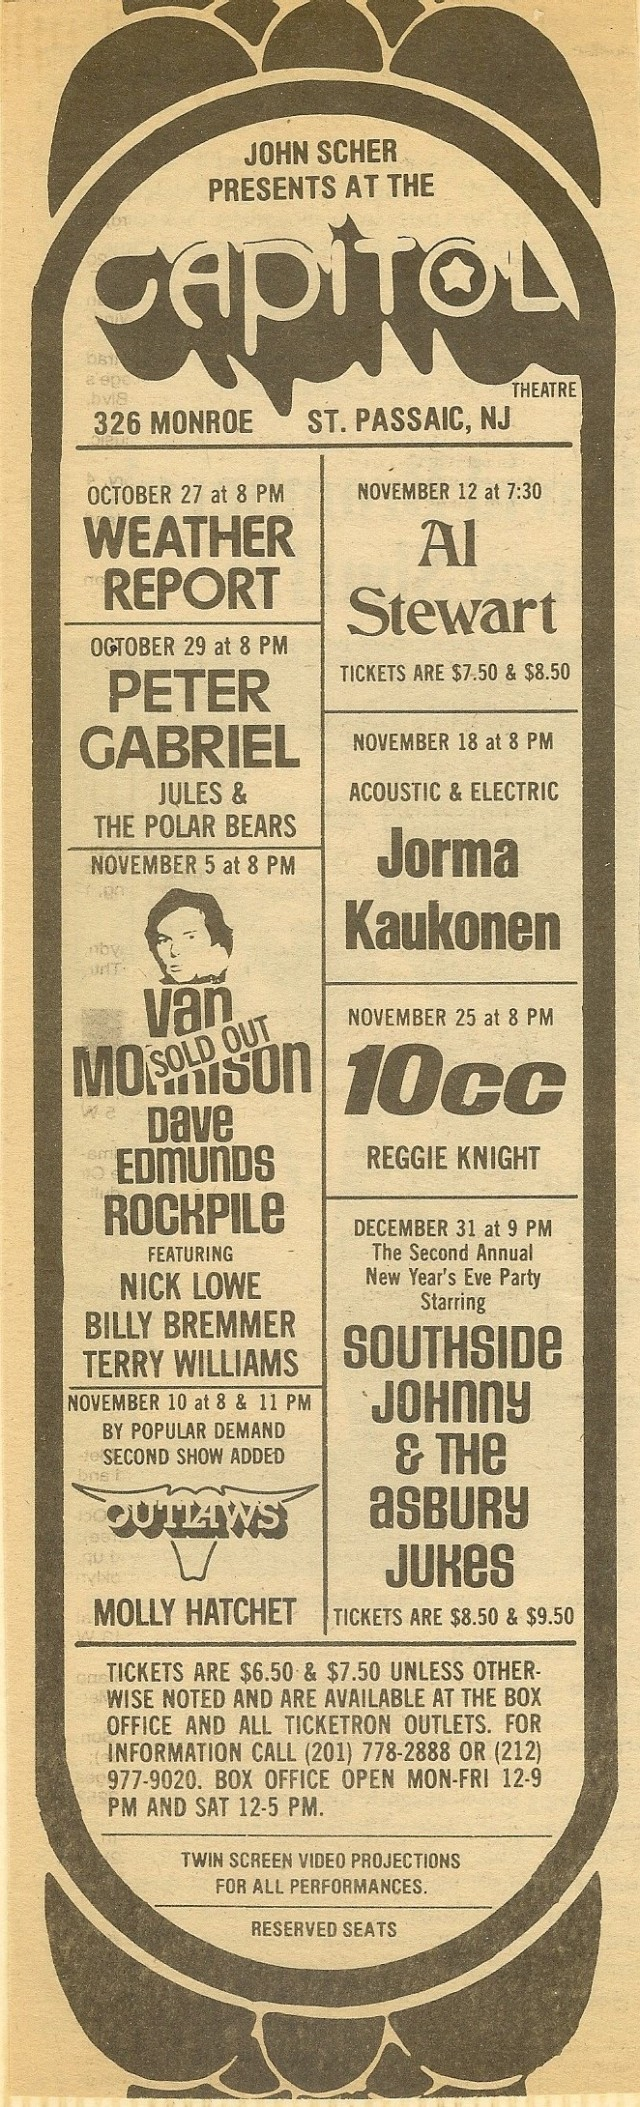 Van Morrison & Rocpile - Capital Ad